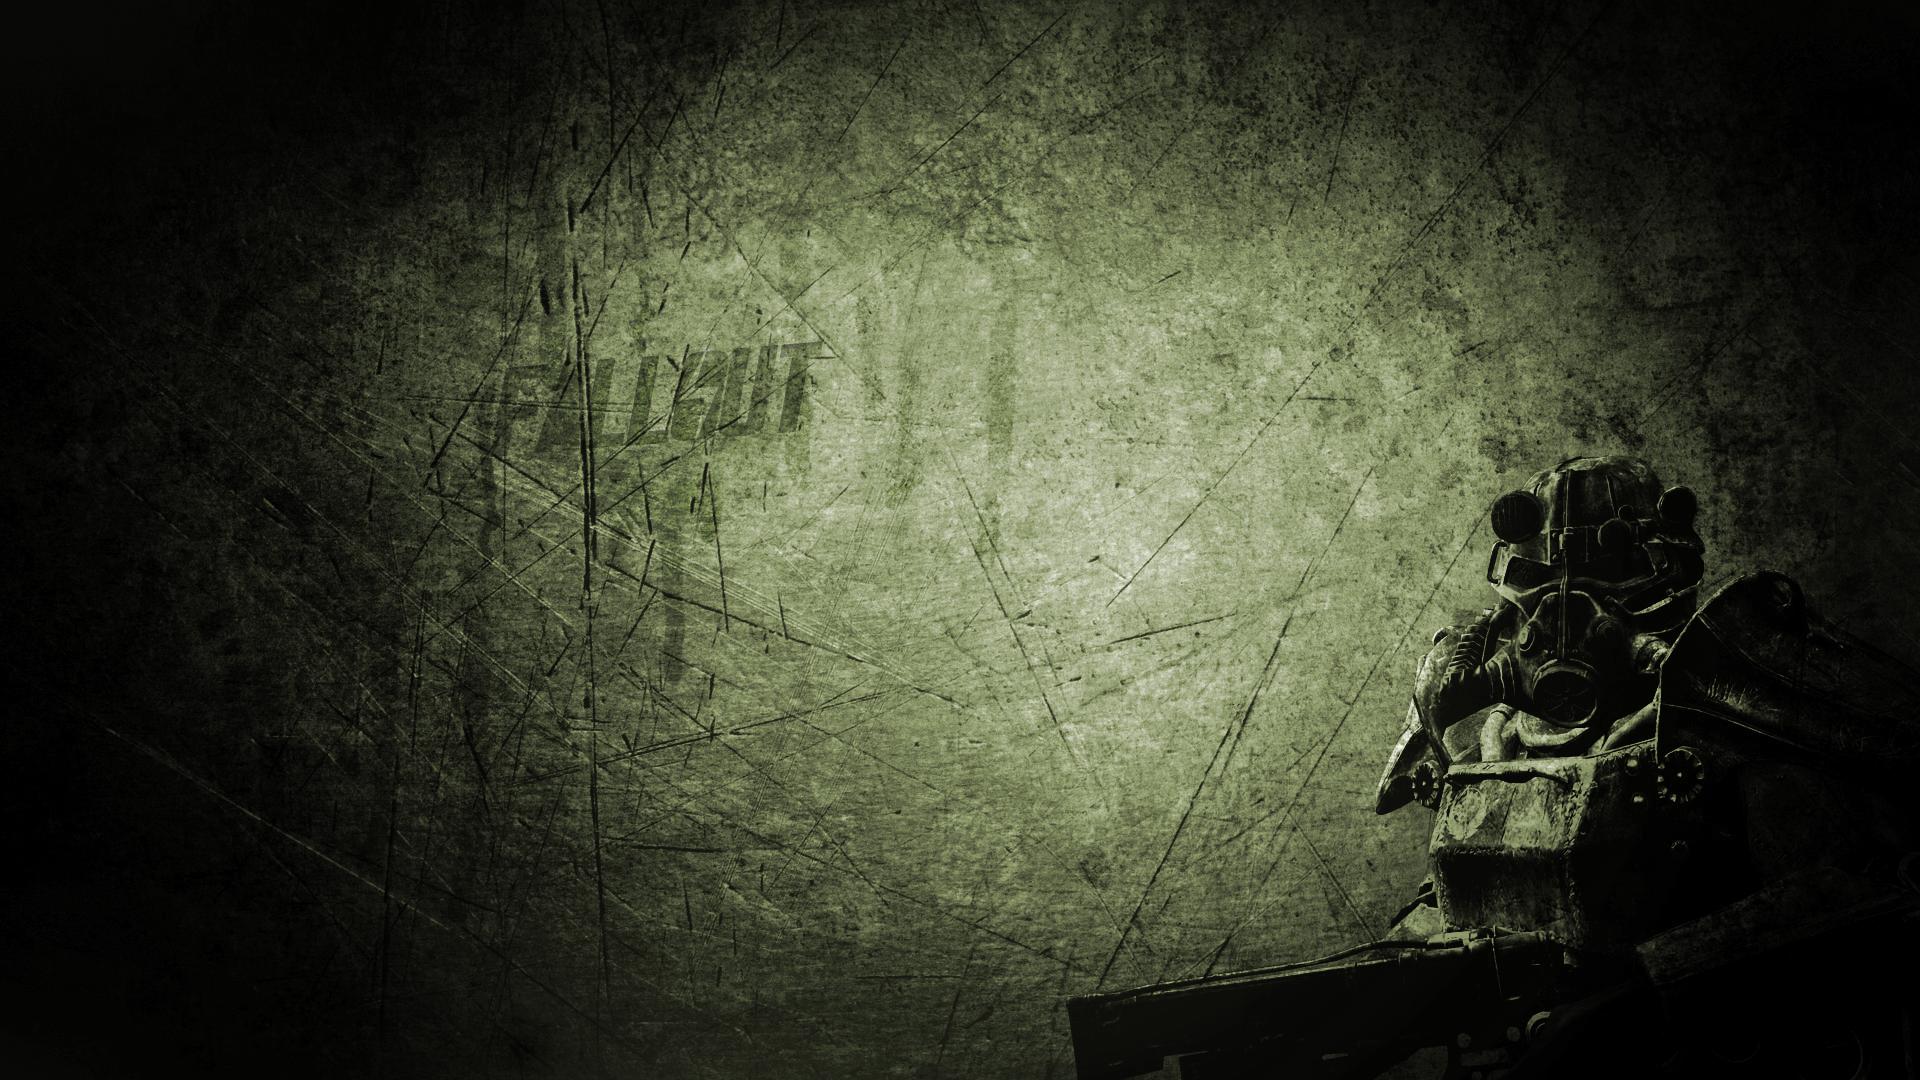 Download Fallout Wallpaper Hd Backgrounds Fallout Wallpaper Fallout Backgrounds Pink Floyd Wallpaper 4k